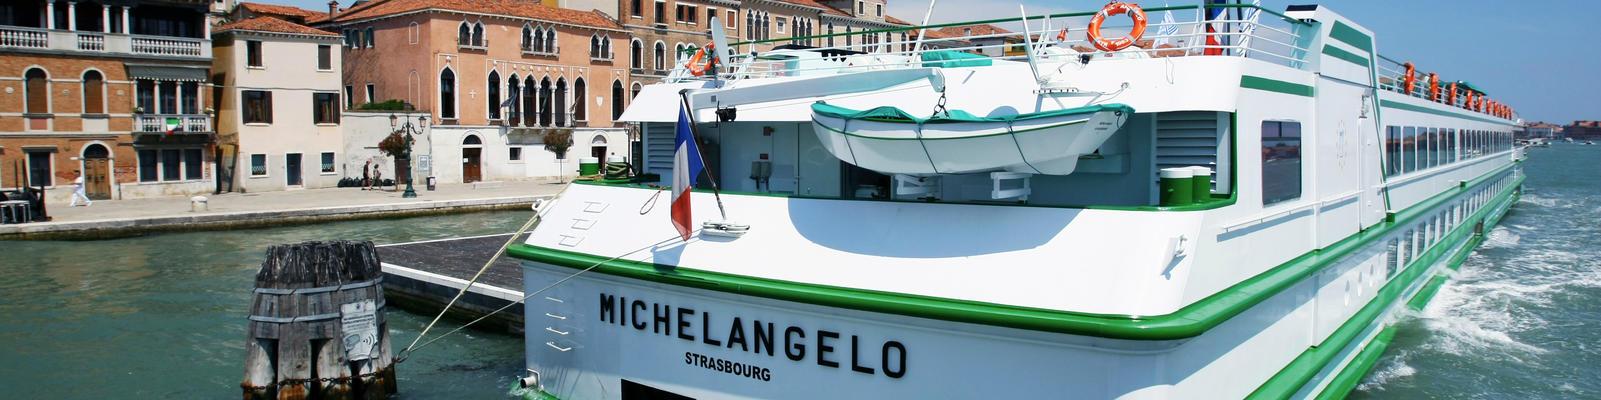 CroisiEurope Michelangelo Cruise Ship Review Photos Departure - Ms michelangelo cruise ship